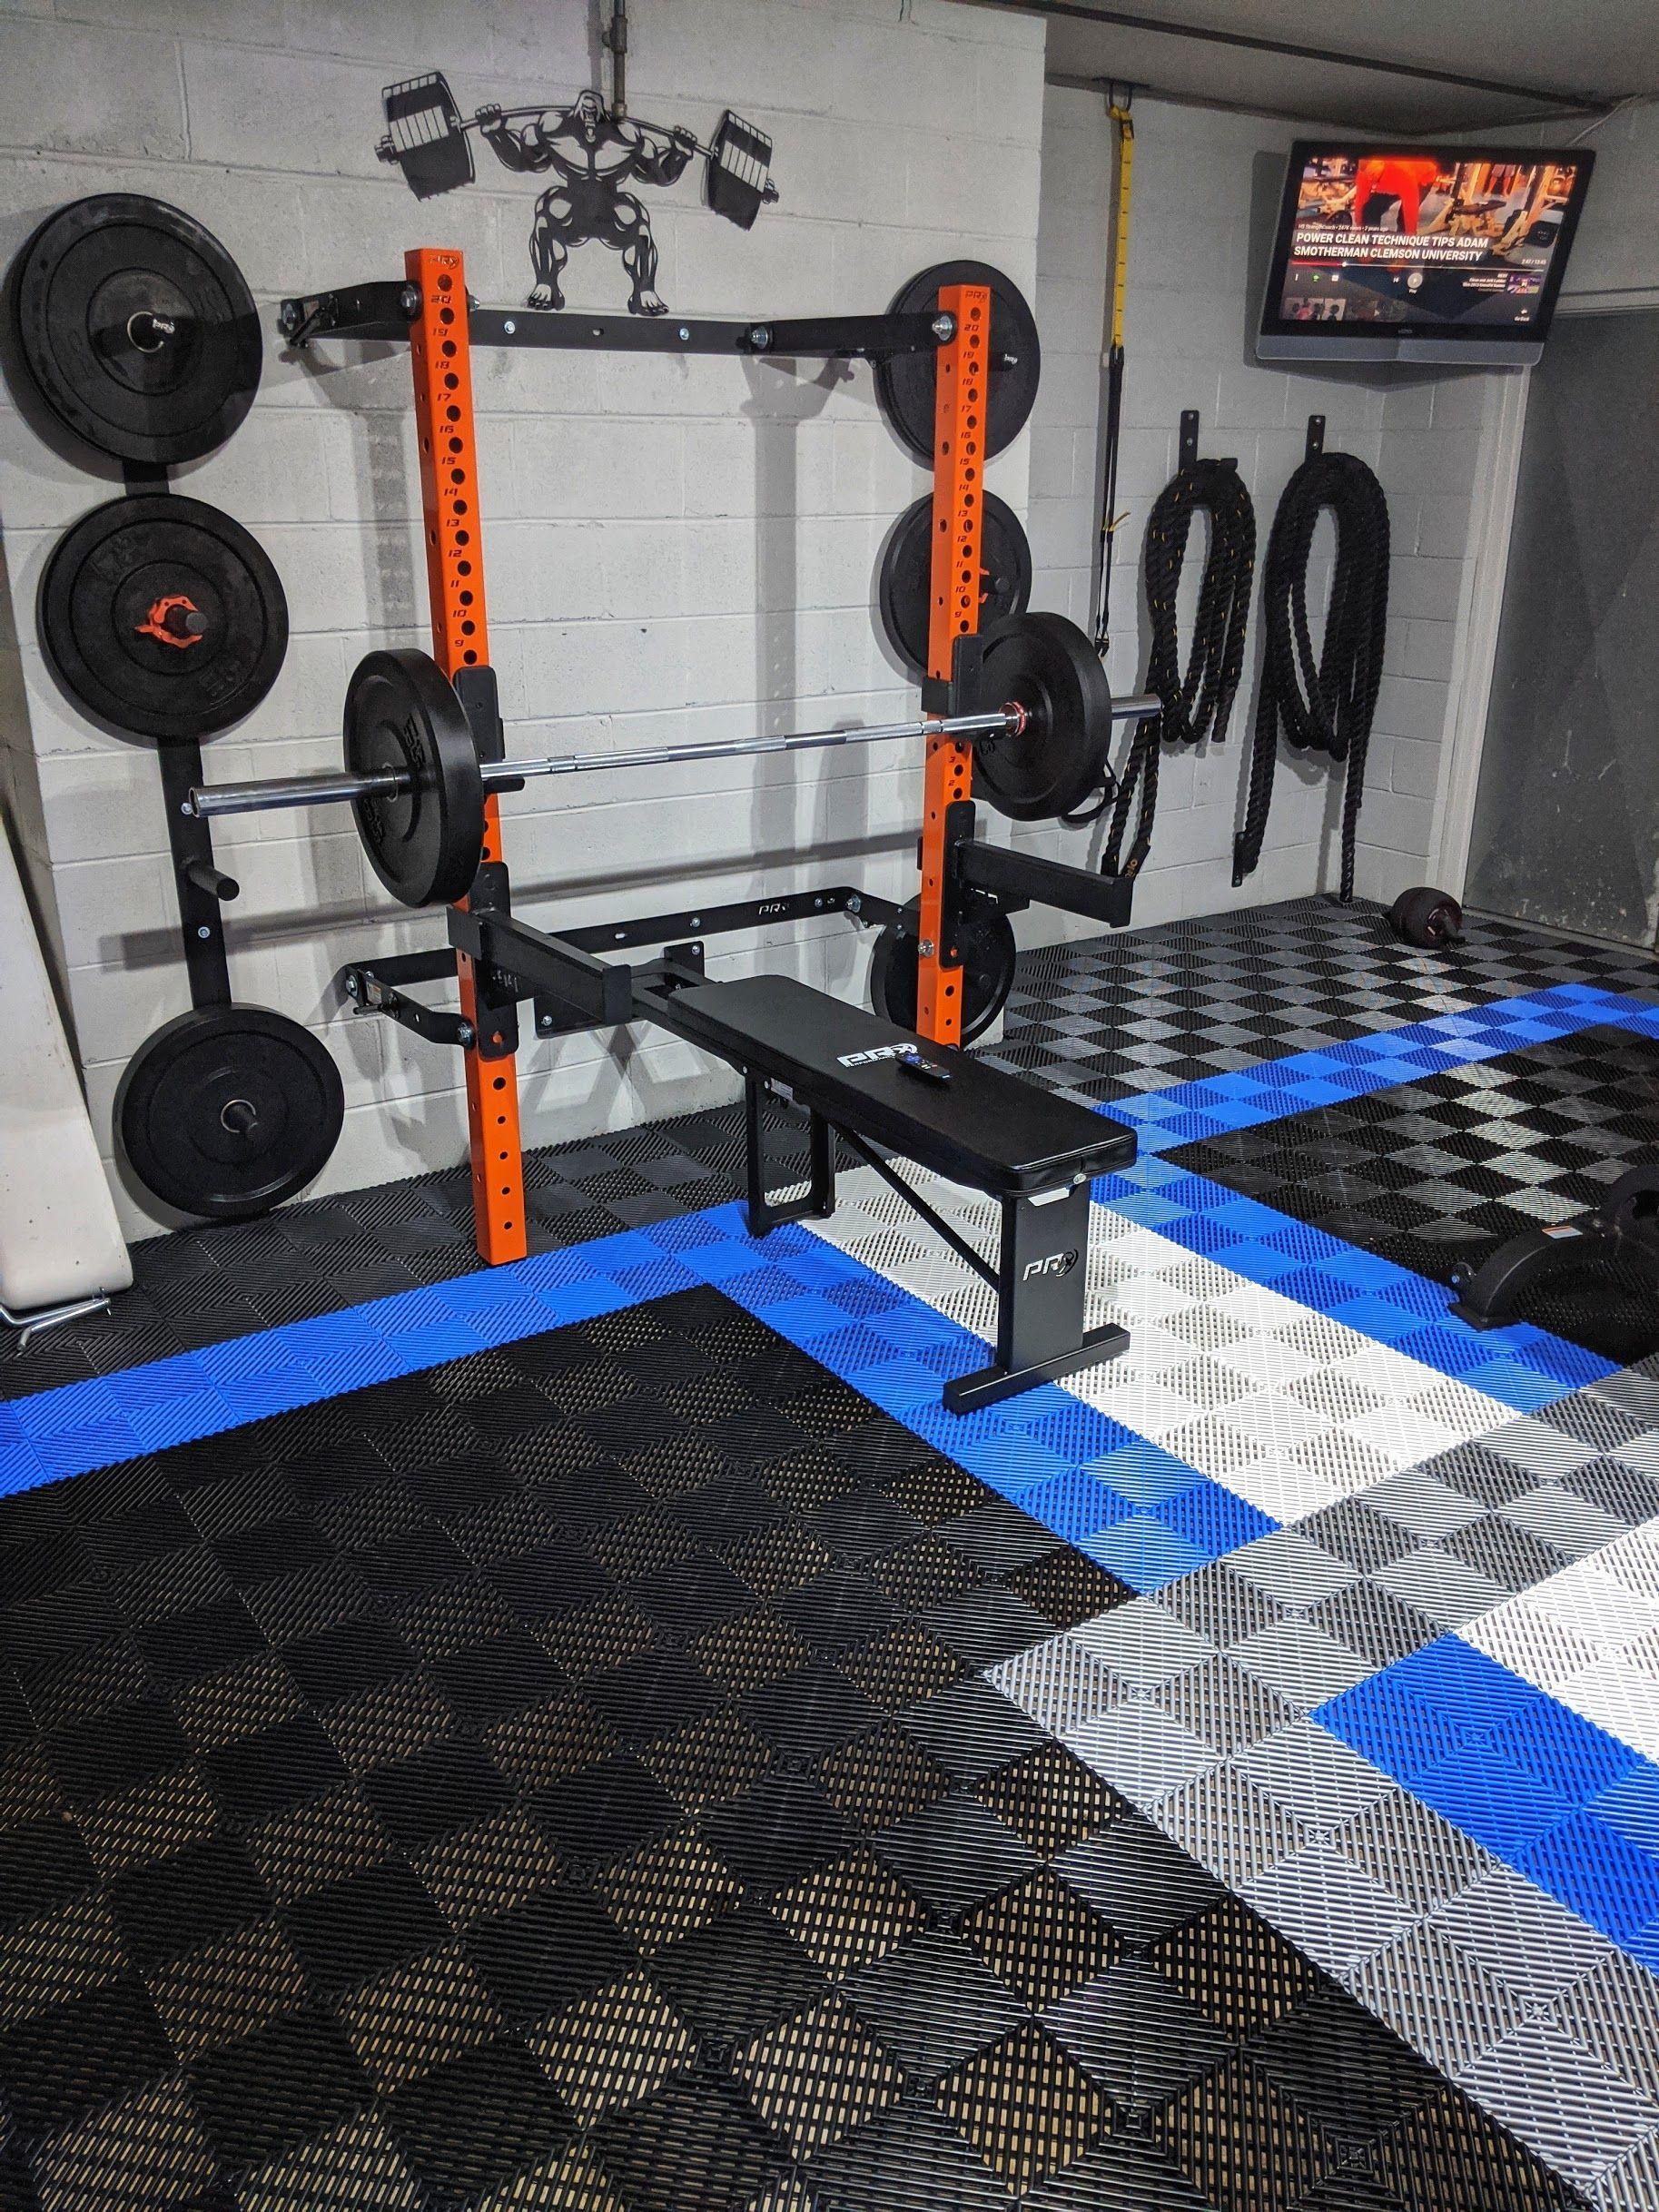 Custom flooring makes the world go round. Custom floor